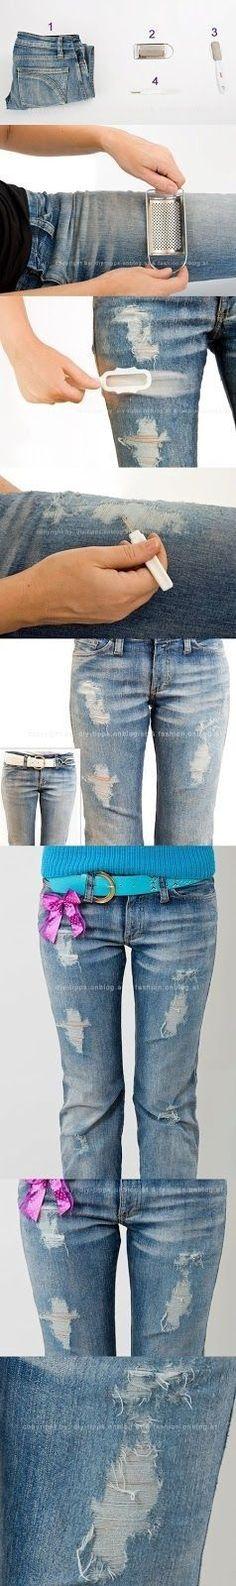 costumizar jeans